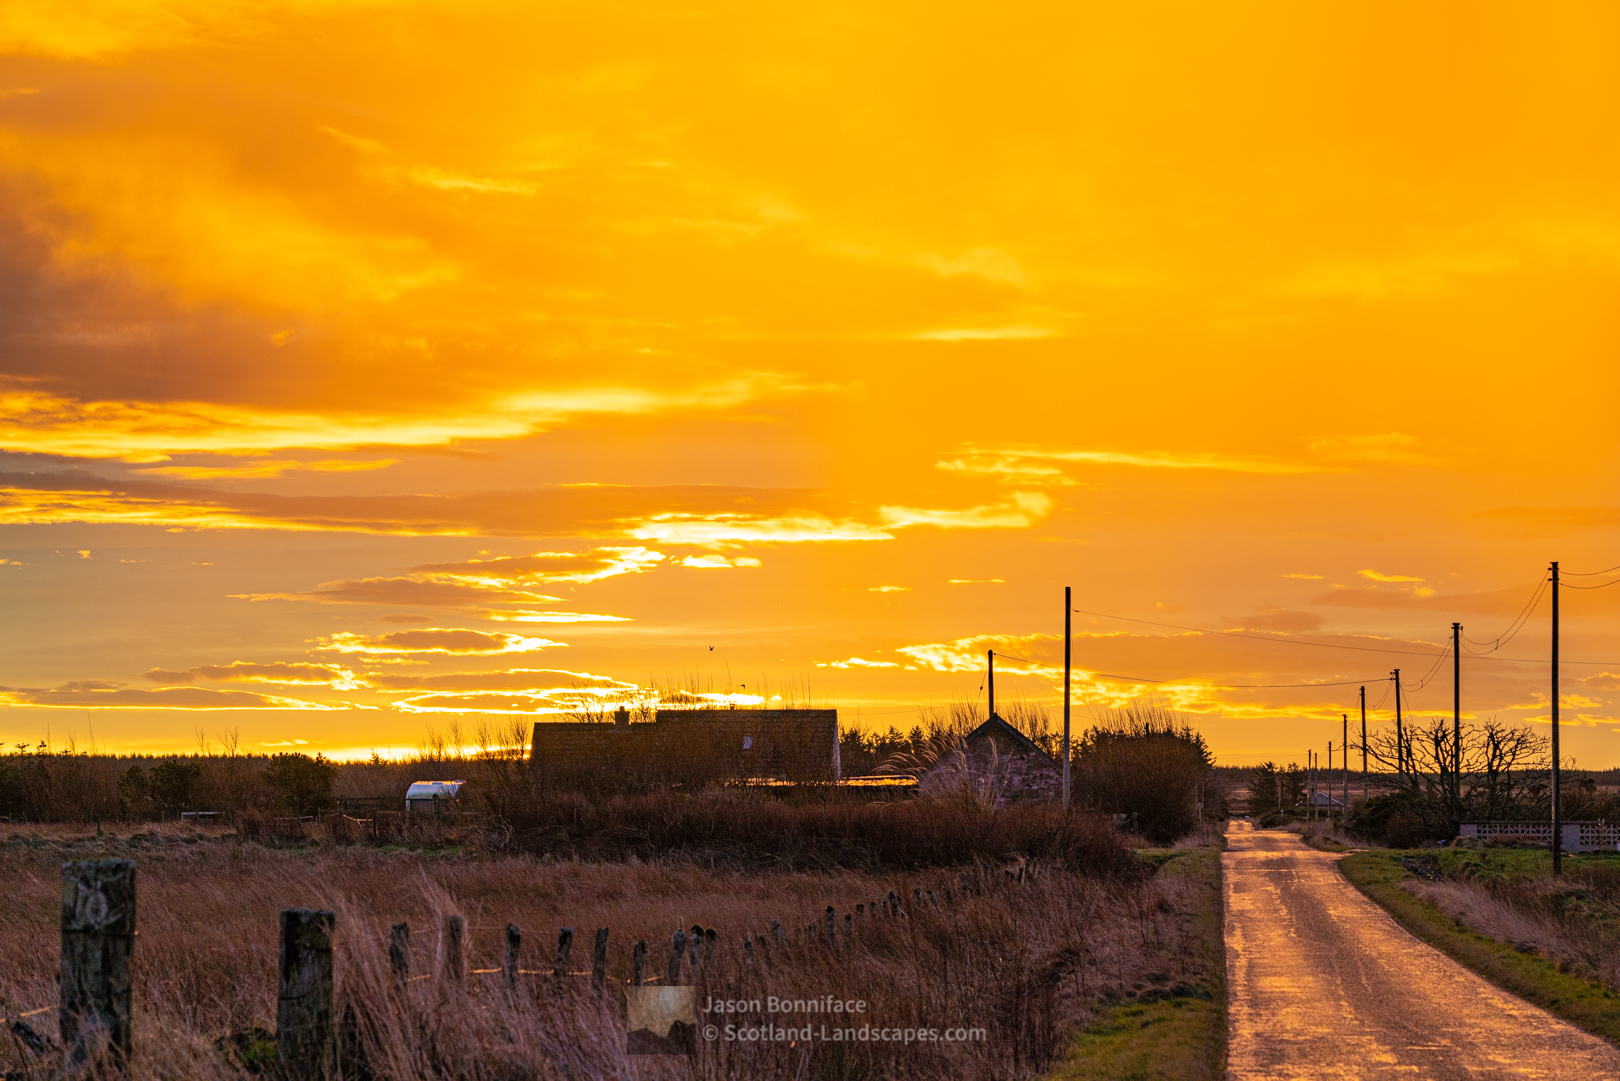 Clouds ablaze as the sun rises